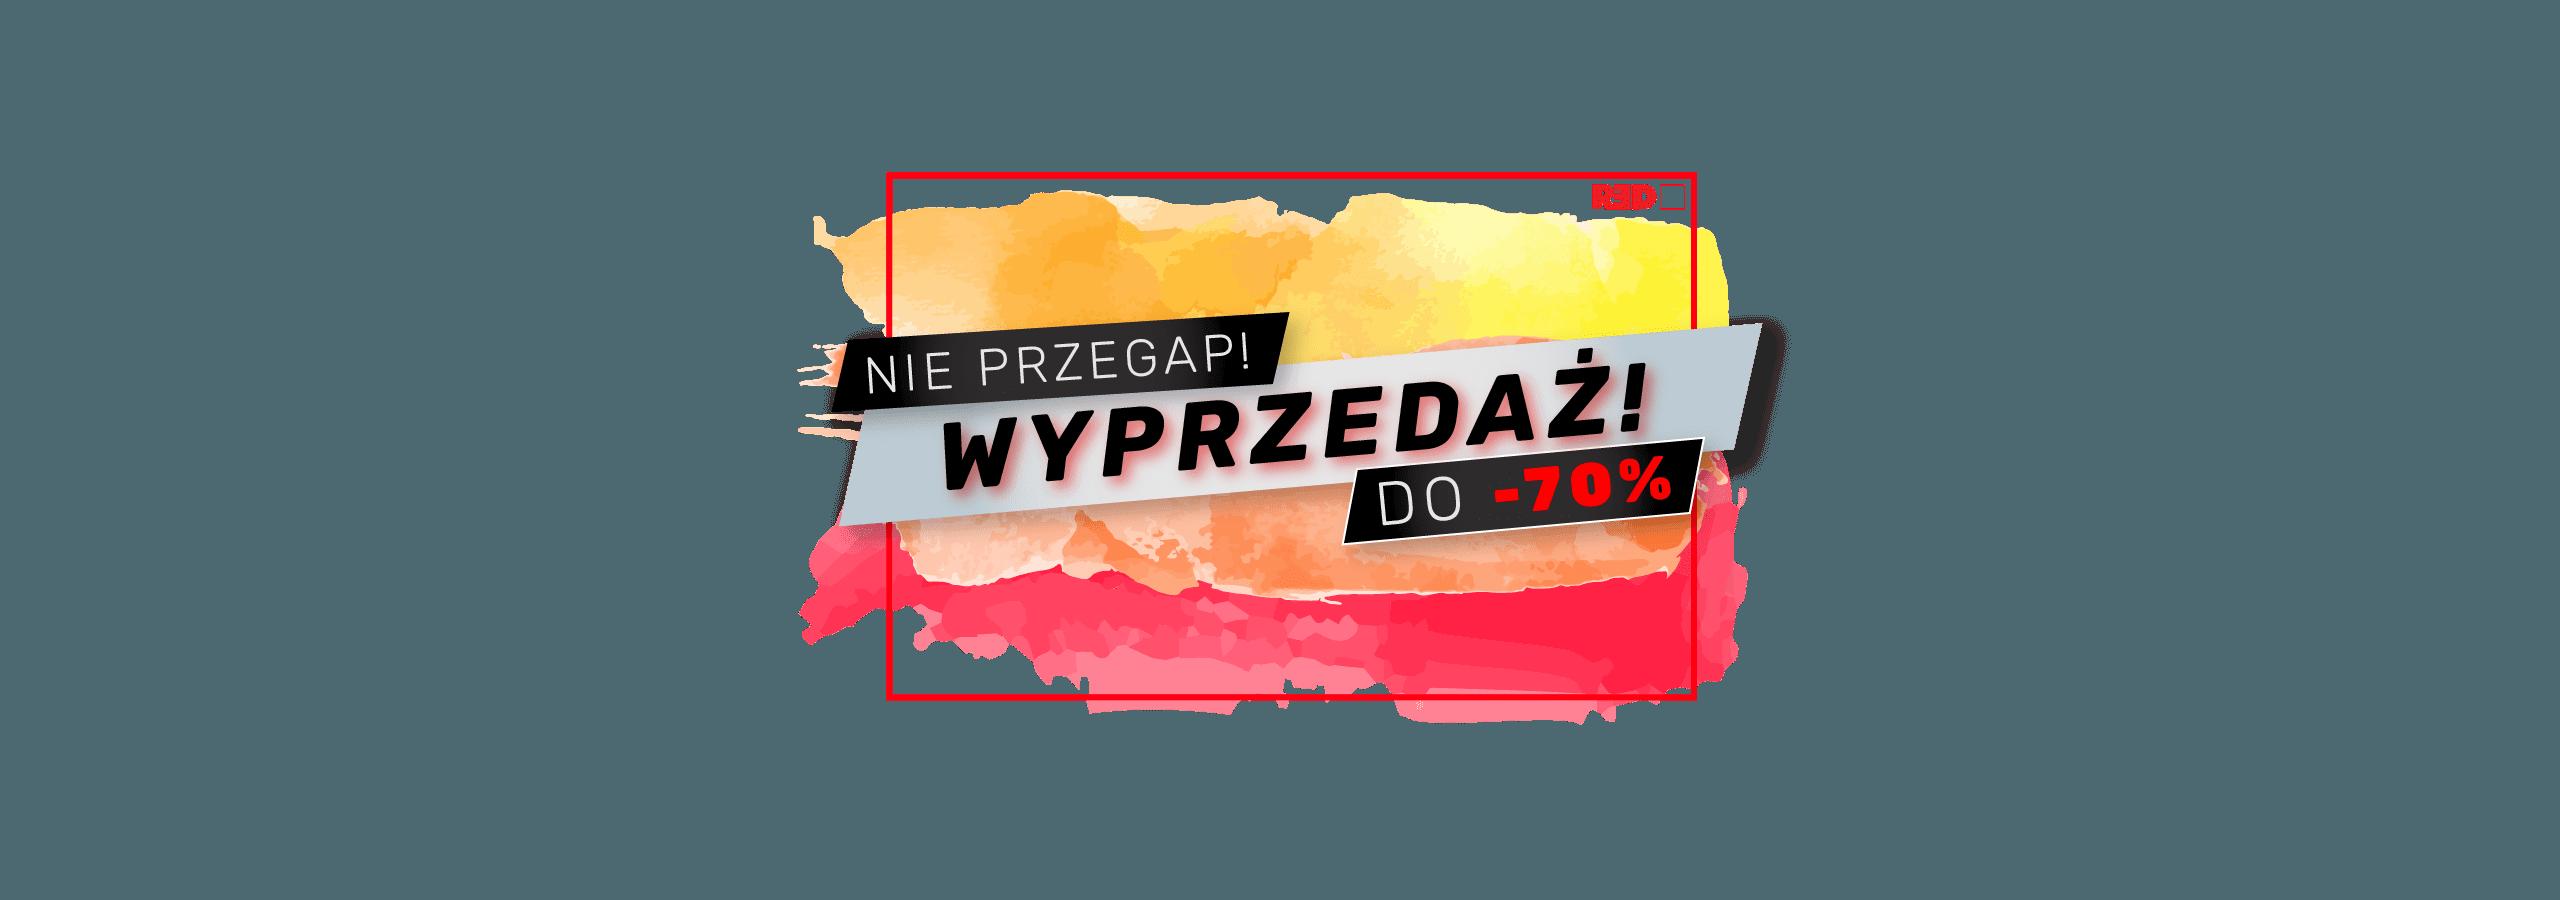 ObuwieRED.pl